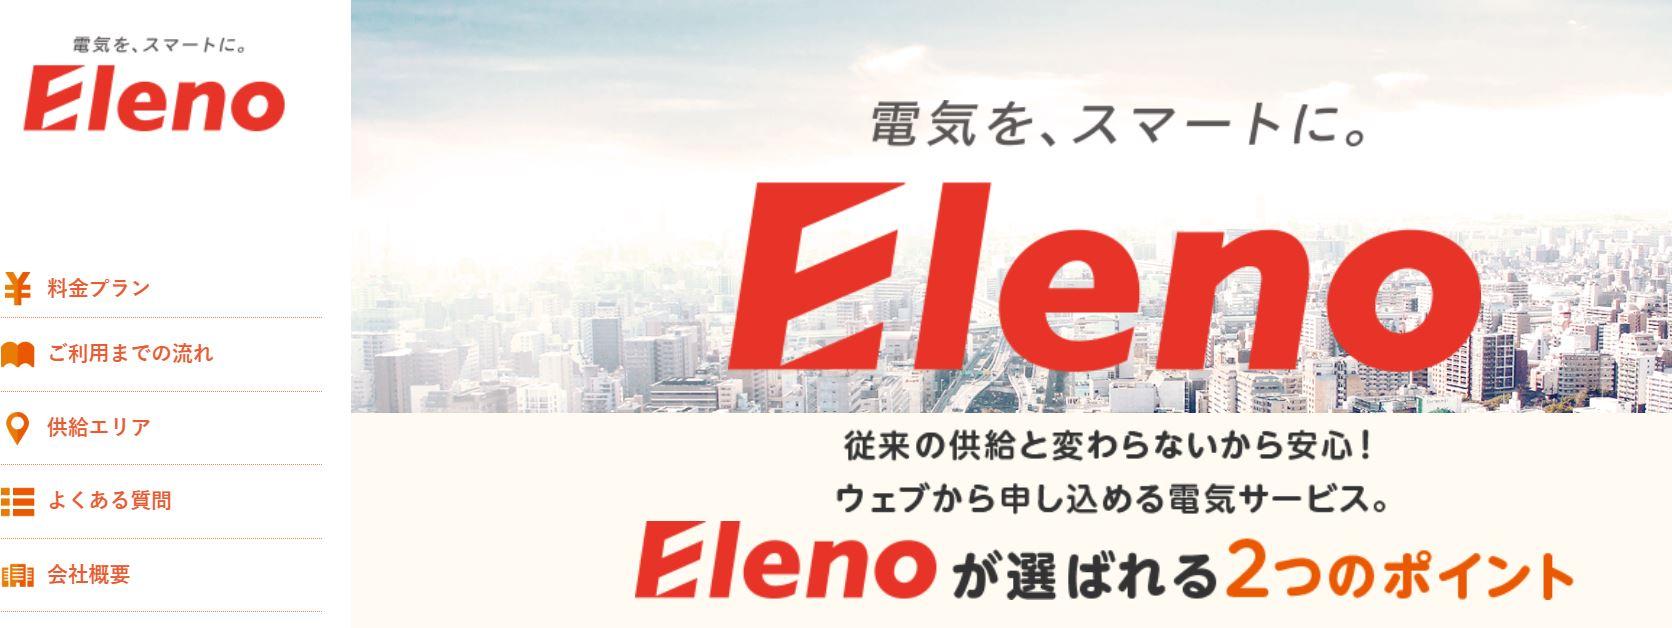 Eleno